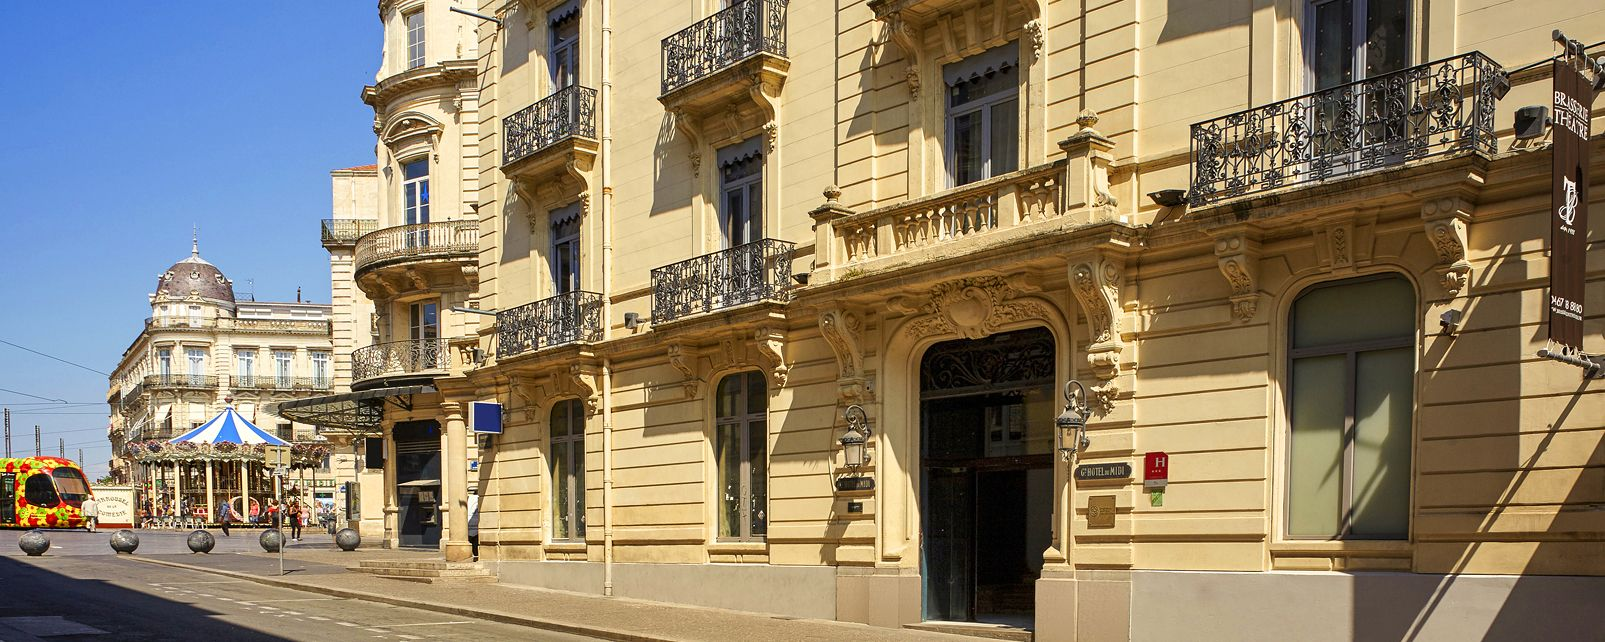 Hôtel Hôtel du Midi